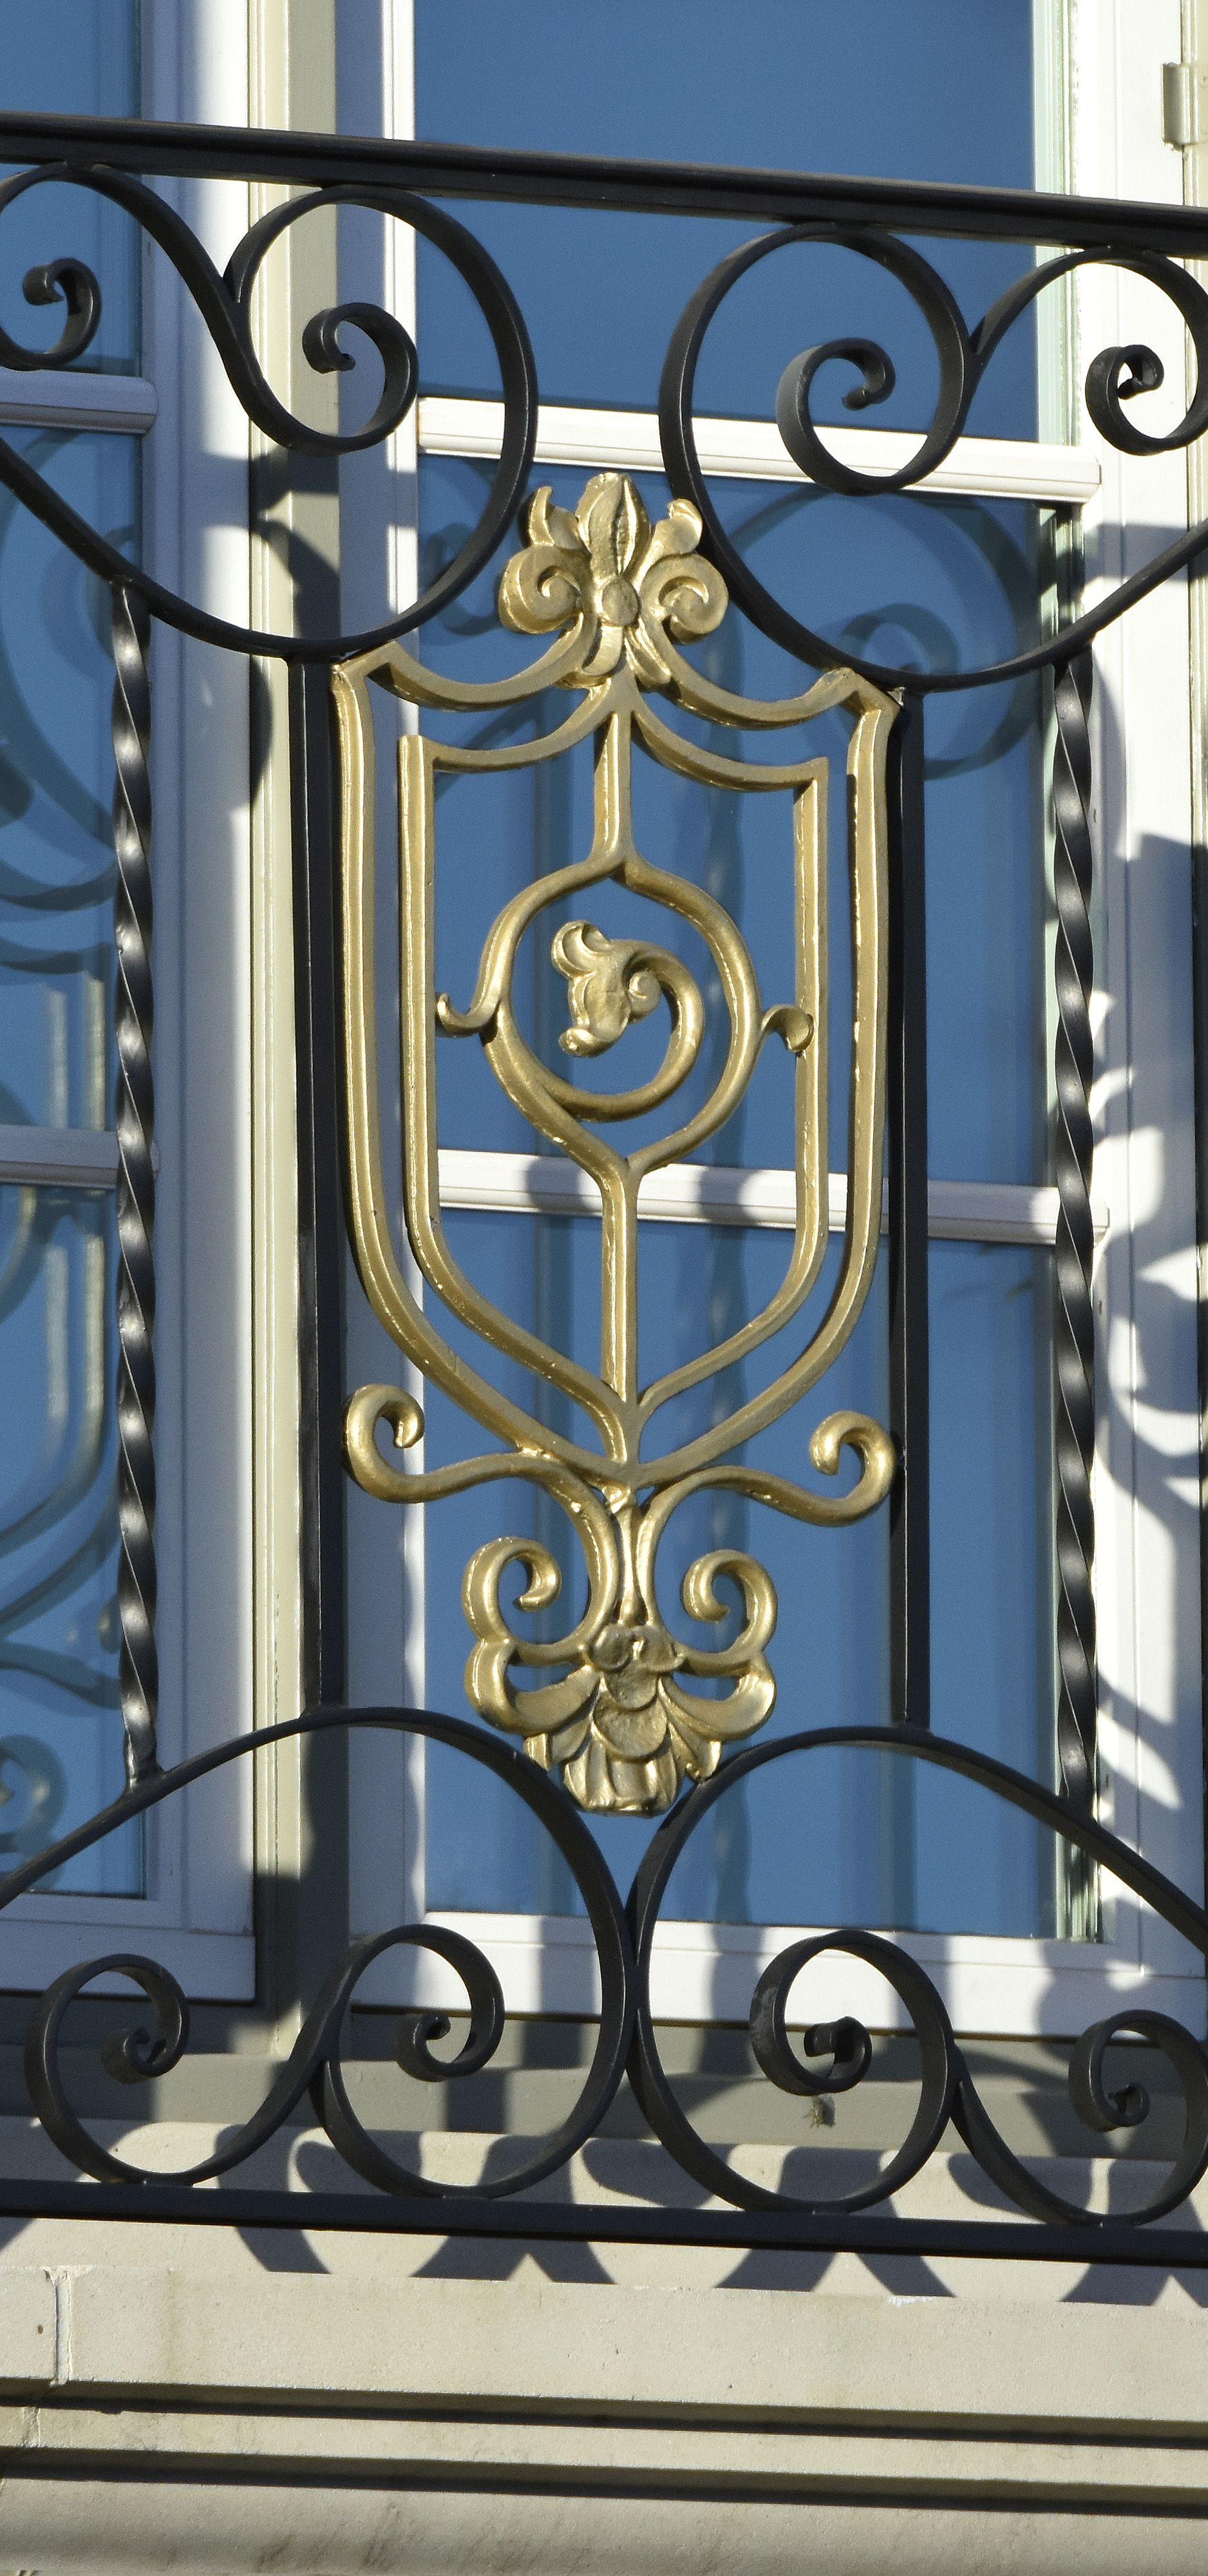 19++ Decorative wrought iron bars ideas